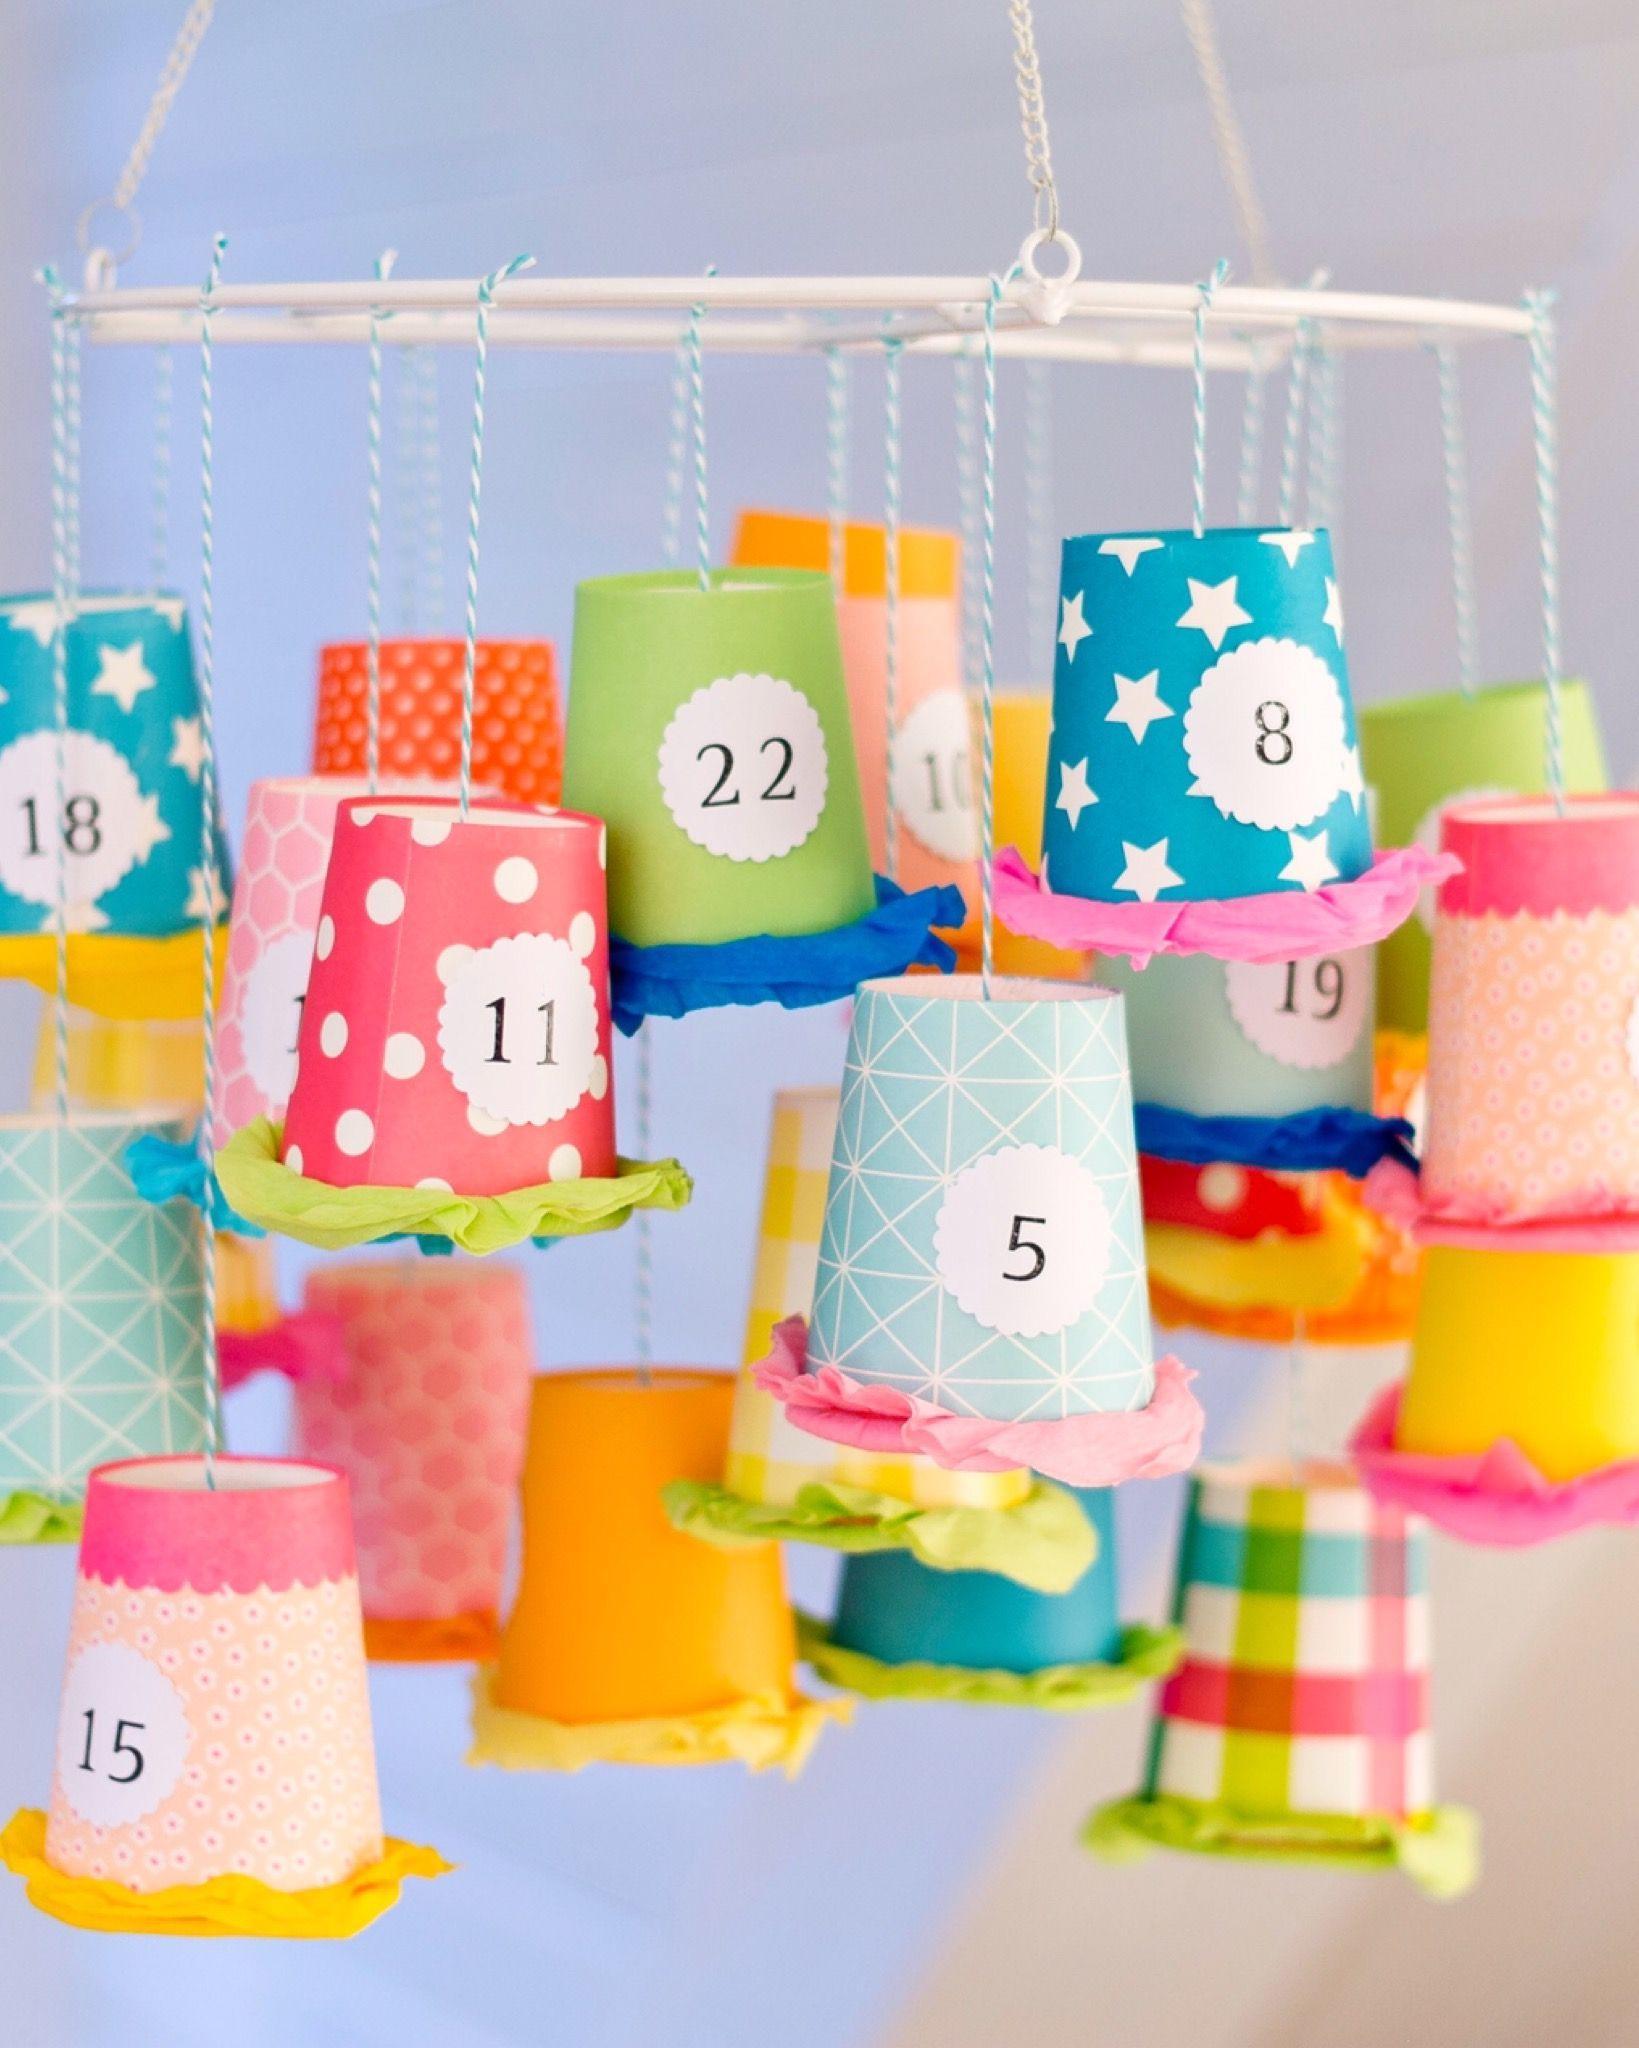 Adventskalender Basteln - 10 Kreative Bastelideen in Adventskalender Selber Machen Kinder